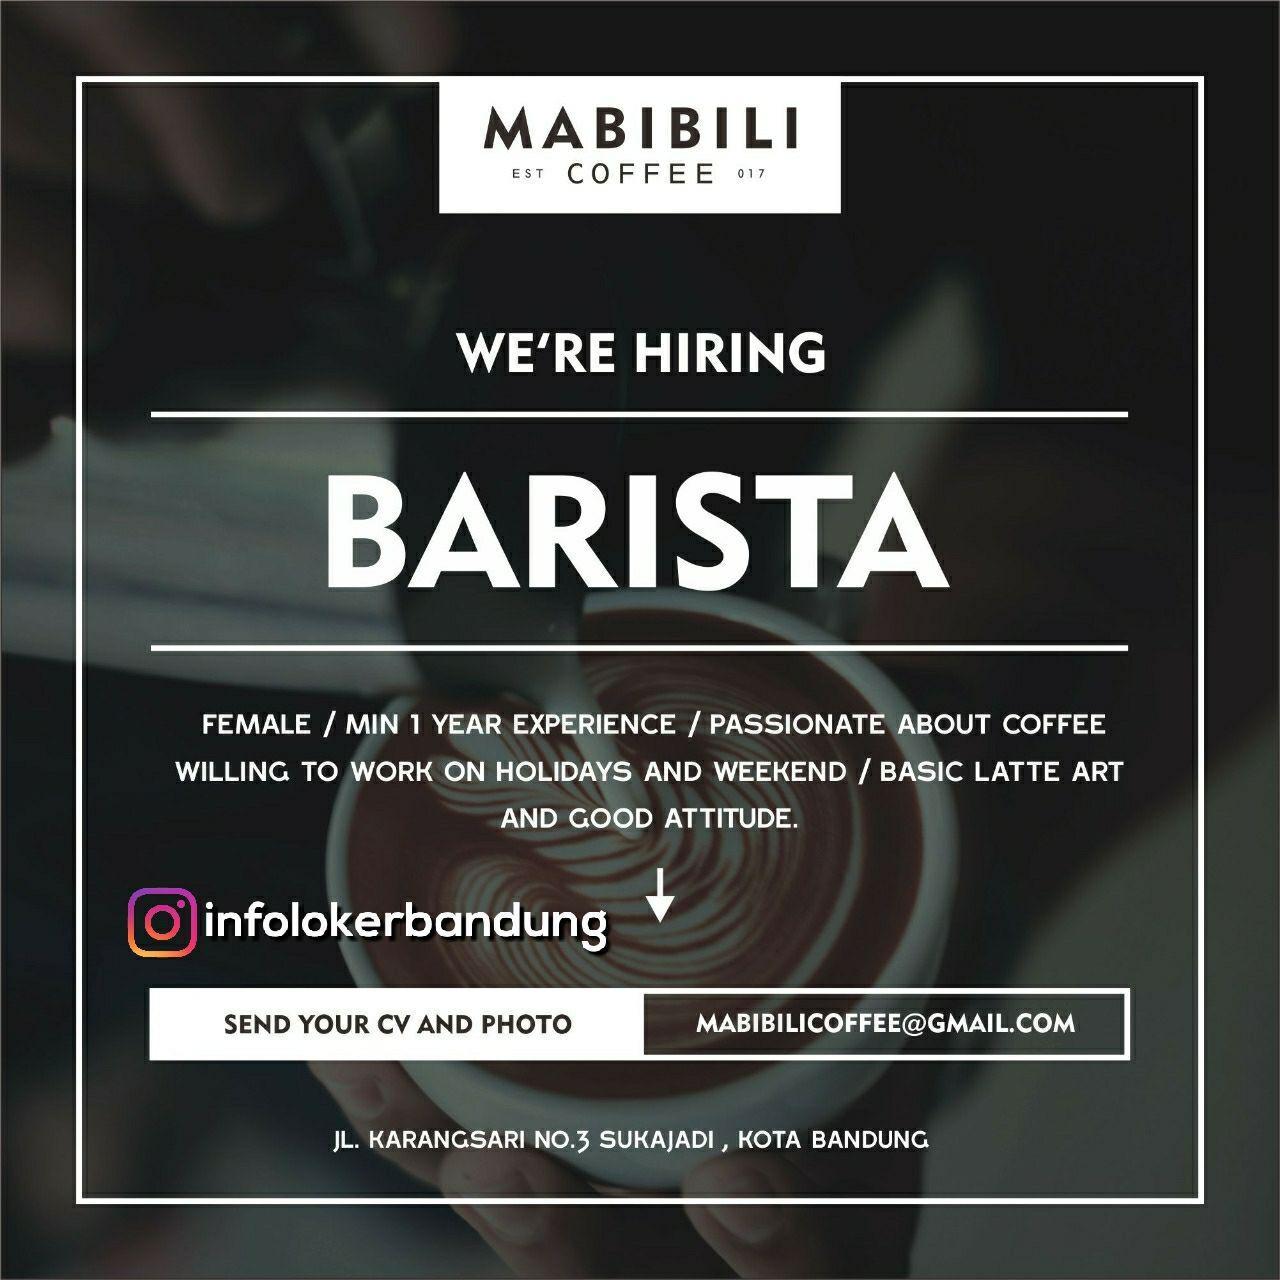 Lowongan kerja Mabibili Coffee Bandung Januari 2018